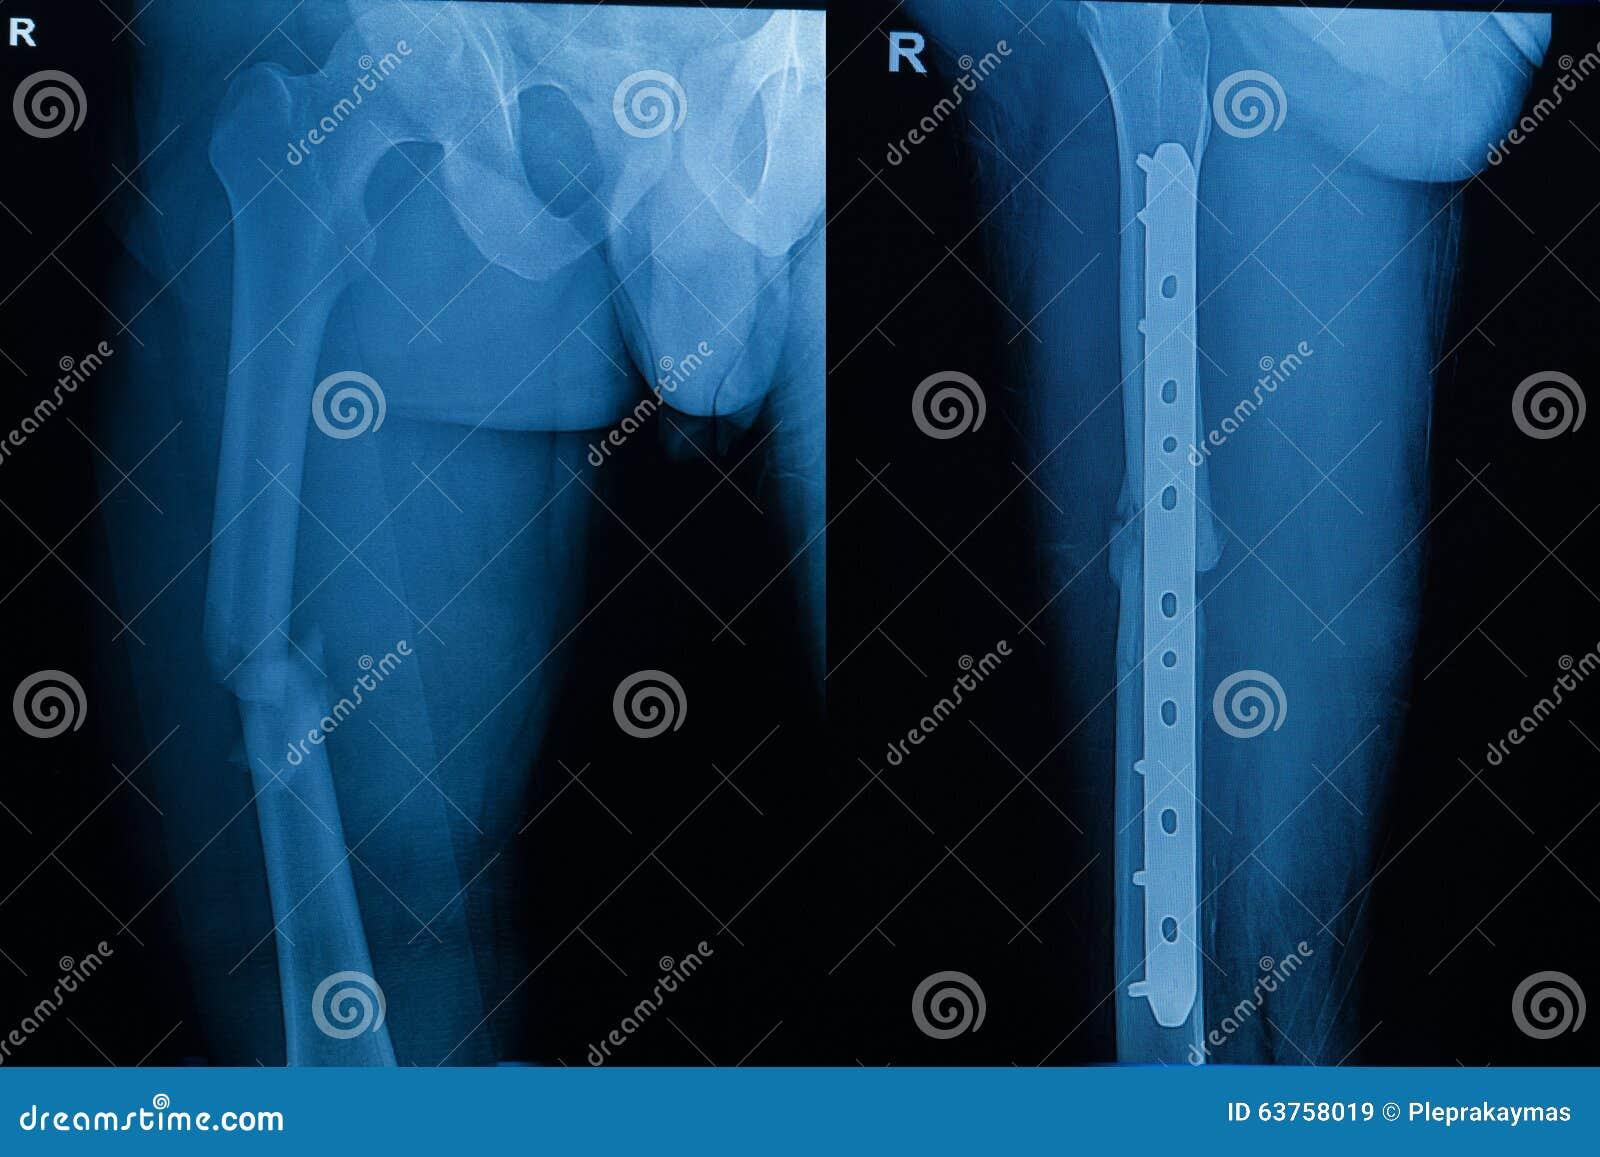 human x-rays showing fracture of femur bone